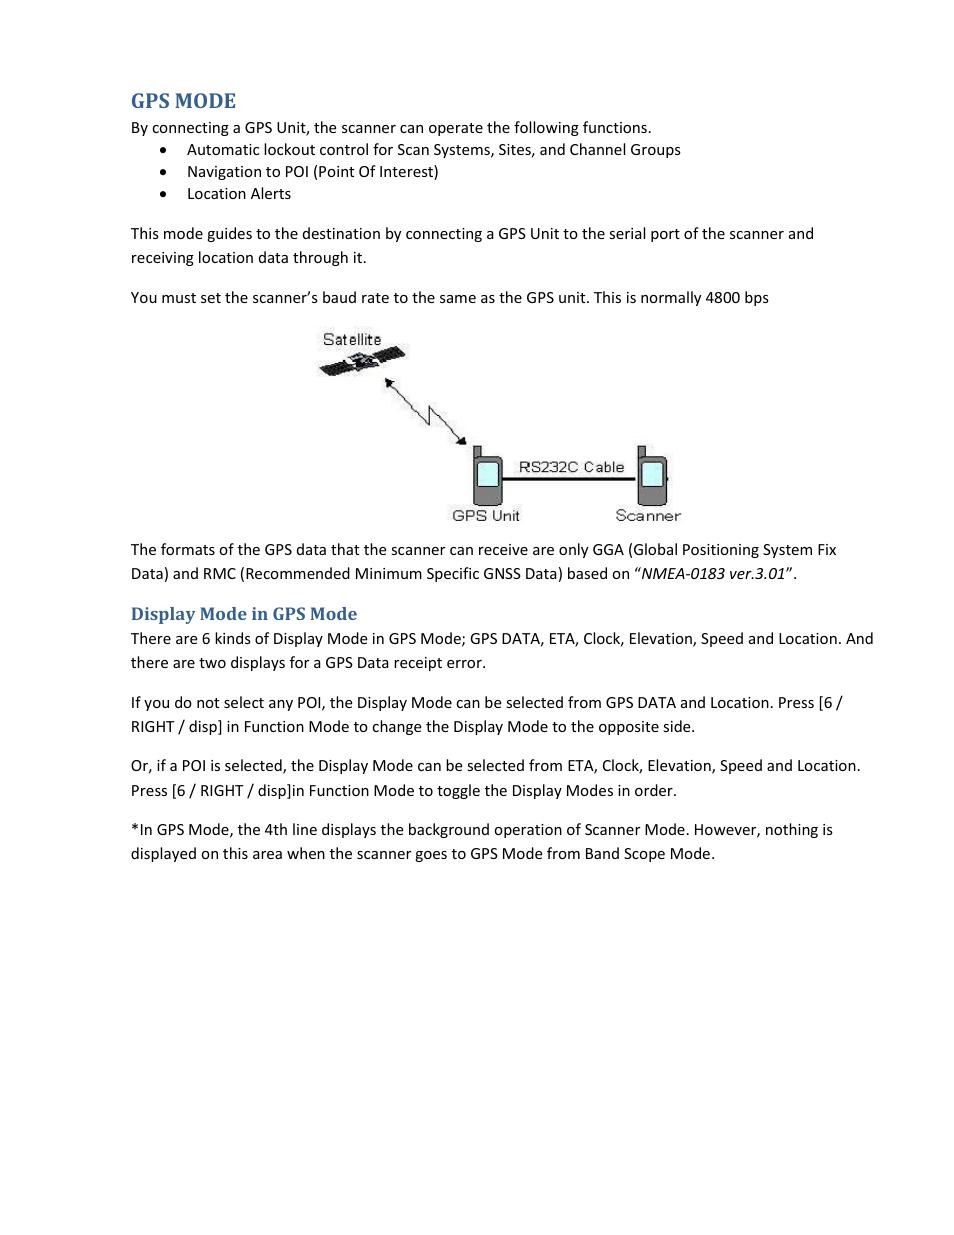 ... Array - gps mode display mode in gps mode uniden bcd396xt user manual  rh manualsdir com